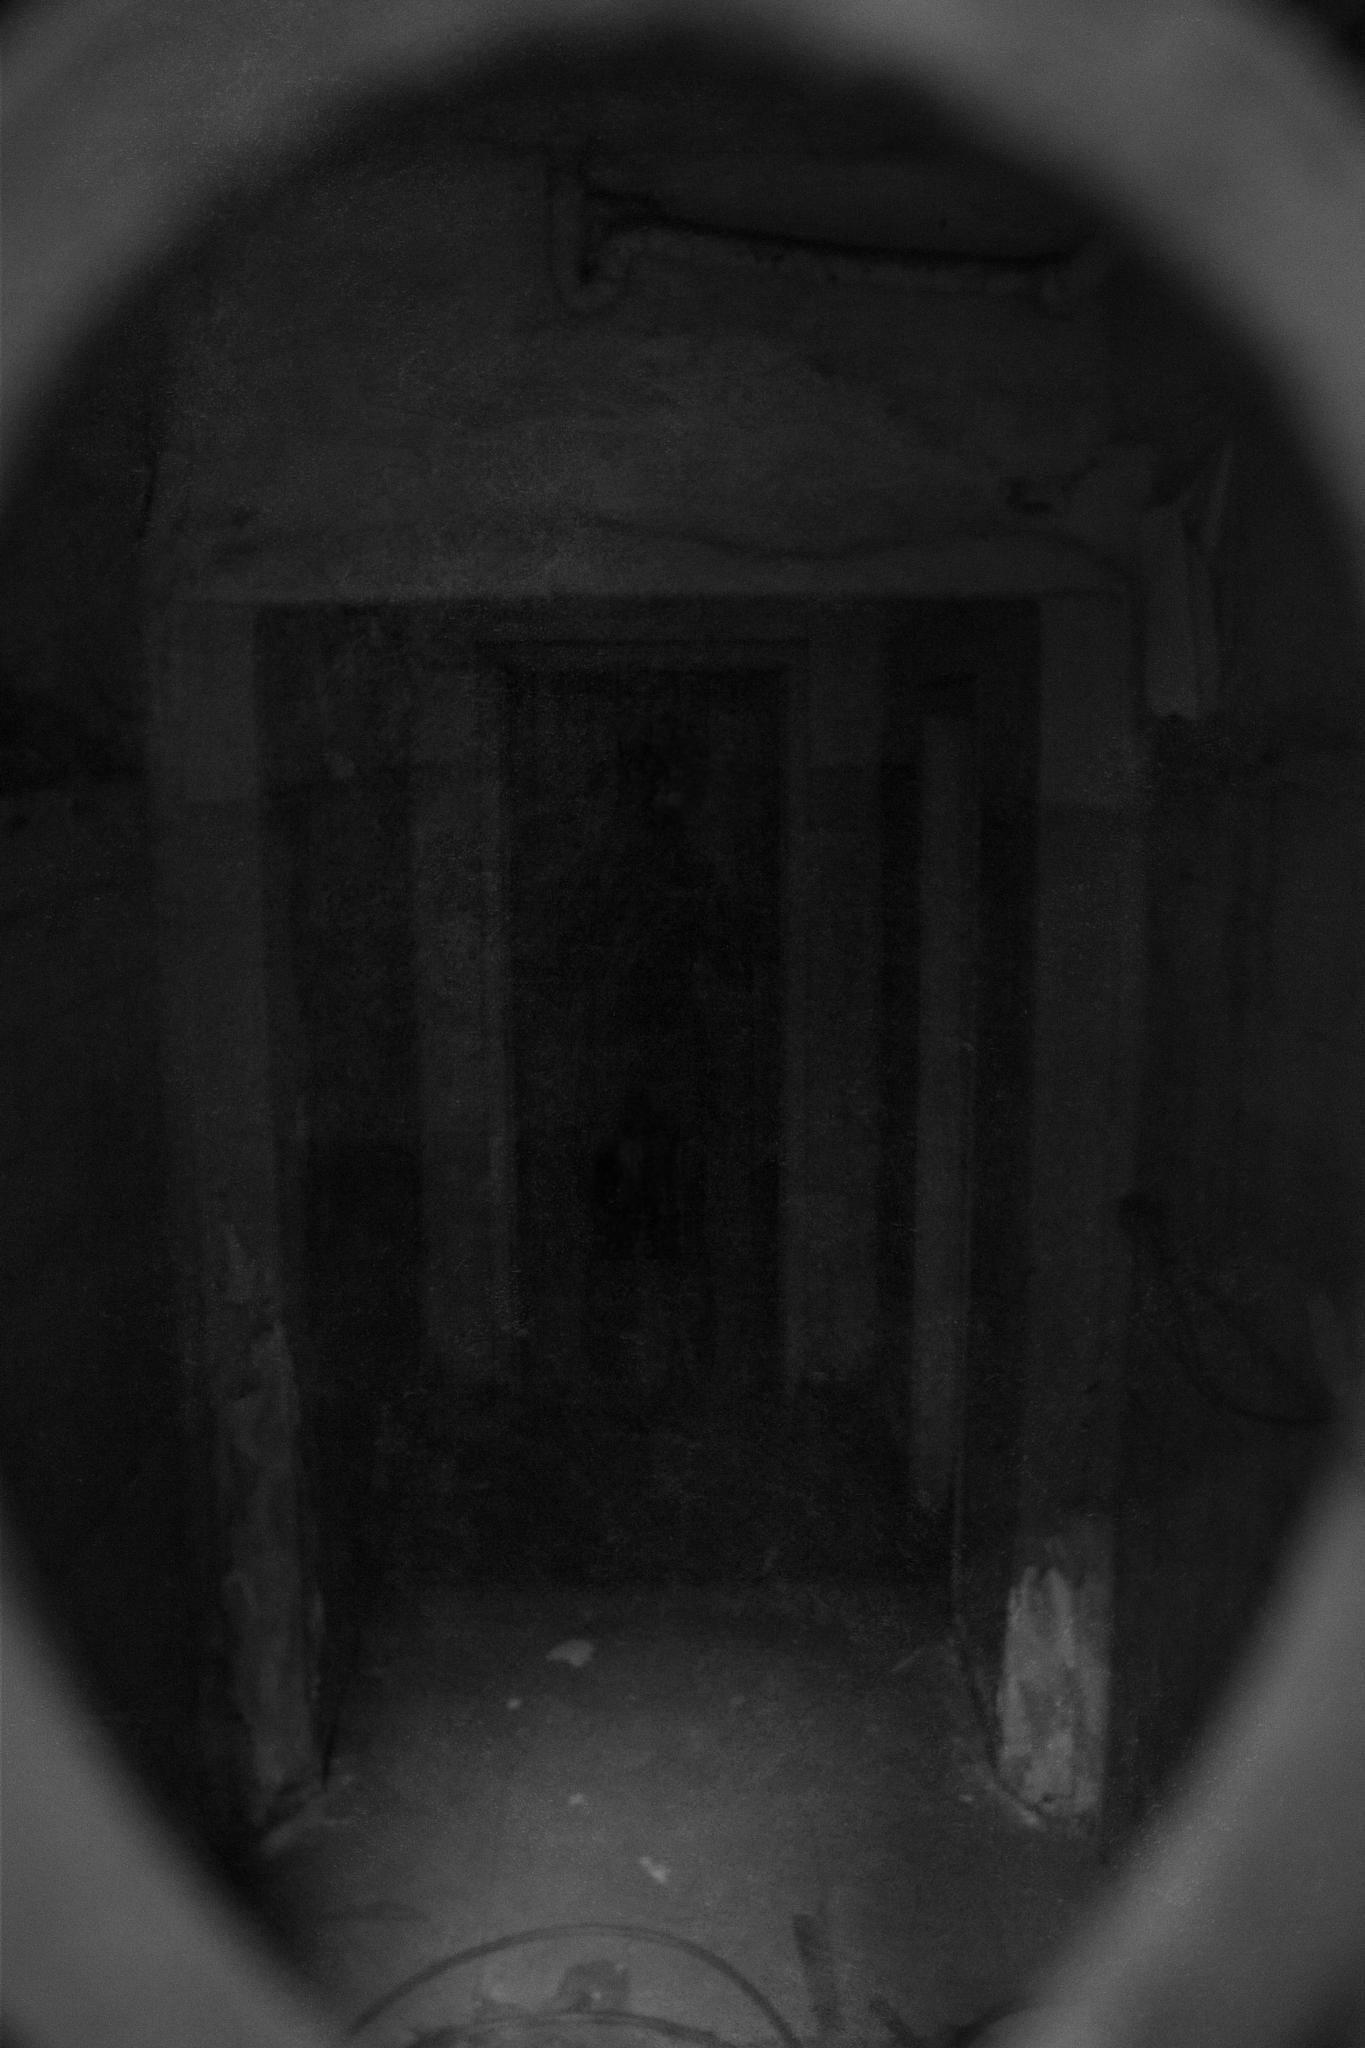 Ghost by Danilo Almeida